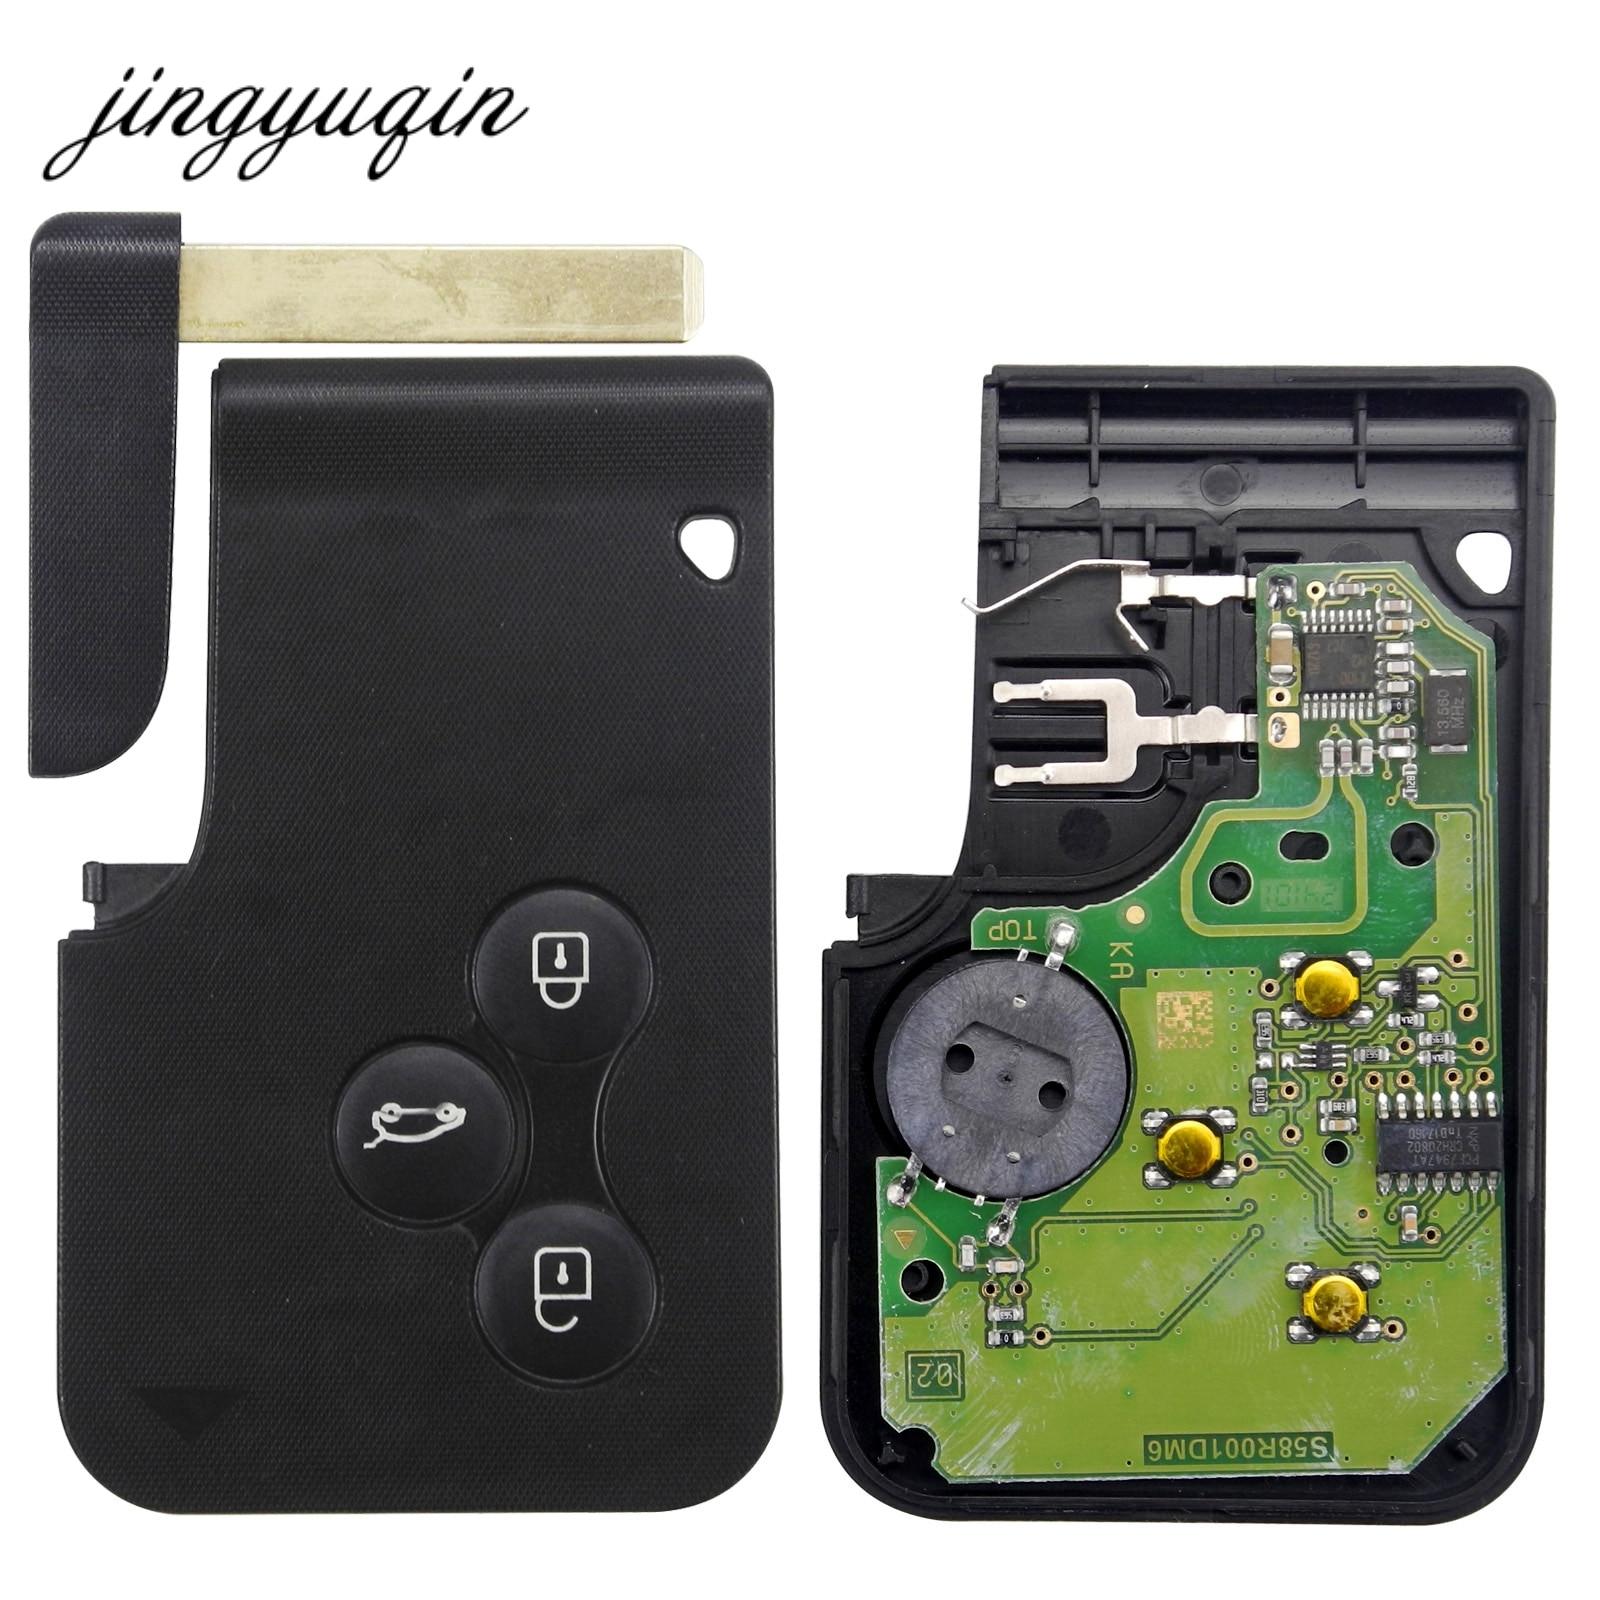 jingyuqin Smart Key Card for Renault Megane II Scenic II Grand Scenic 2003-2008 433mhz PCF7947 Chip ID46 3 Button Remote PCB